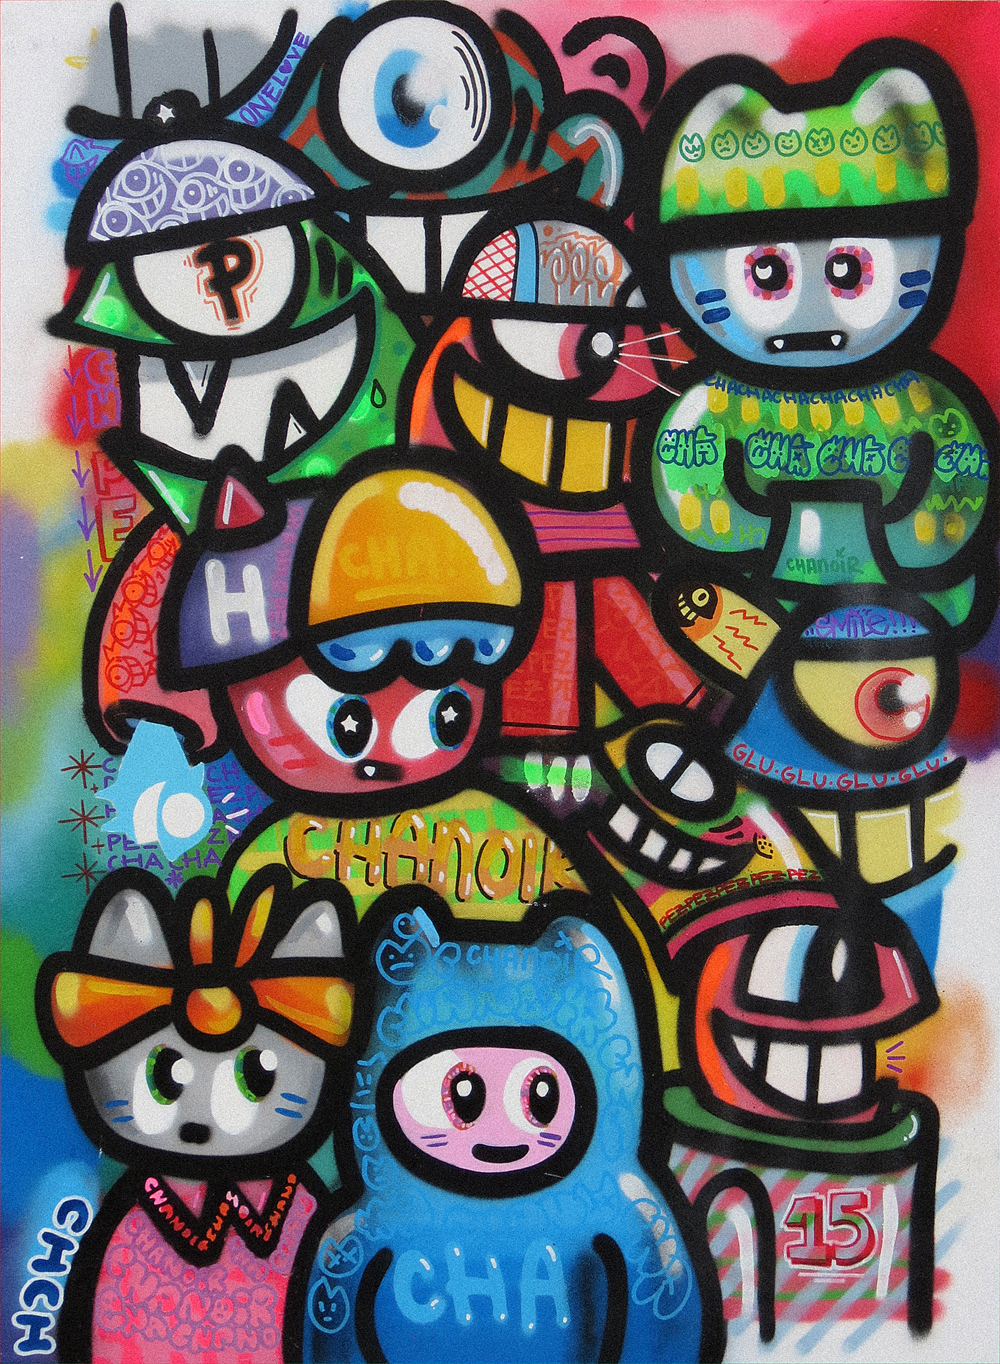 pez and chanoir_mixed media on canvas_85 x 106 x 5cm_£2200.jpg